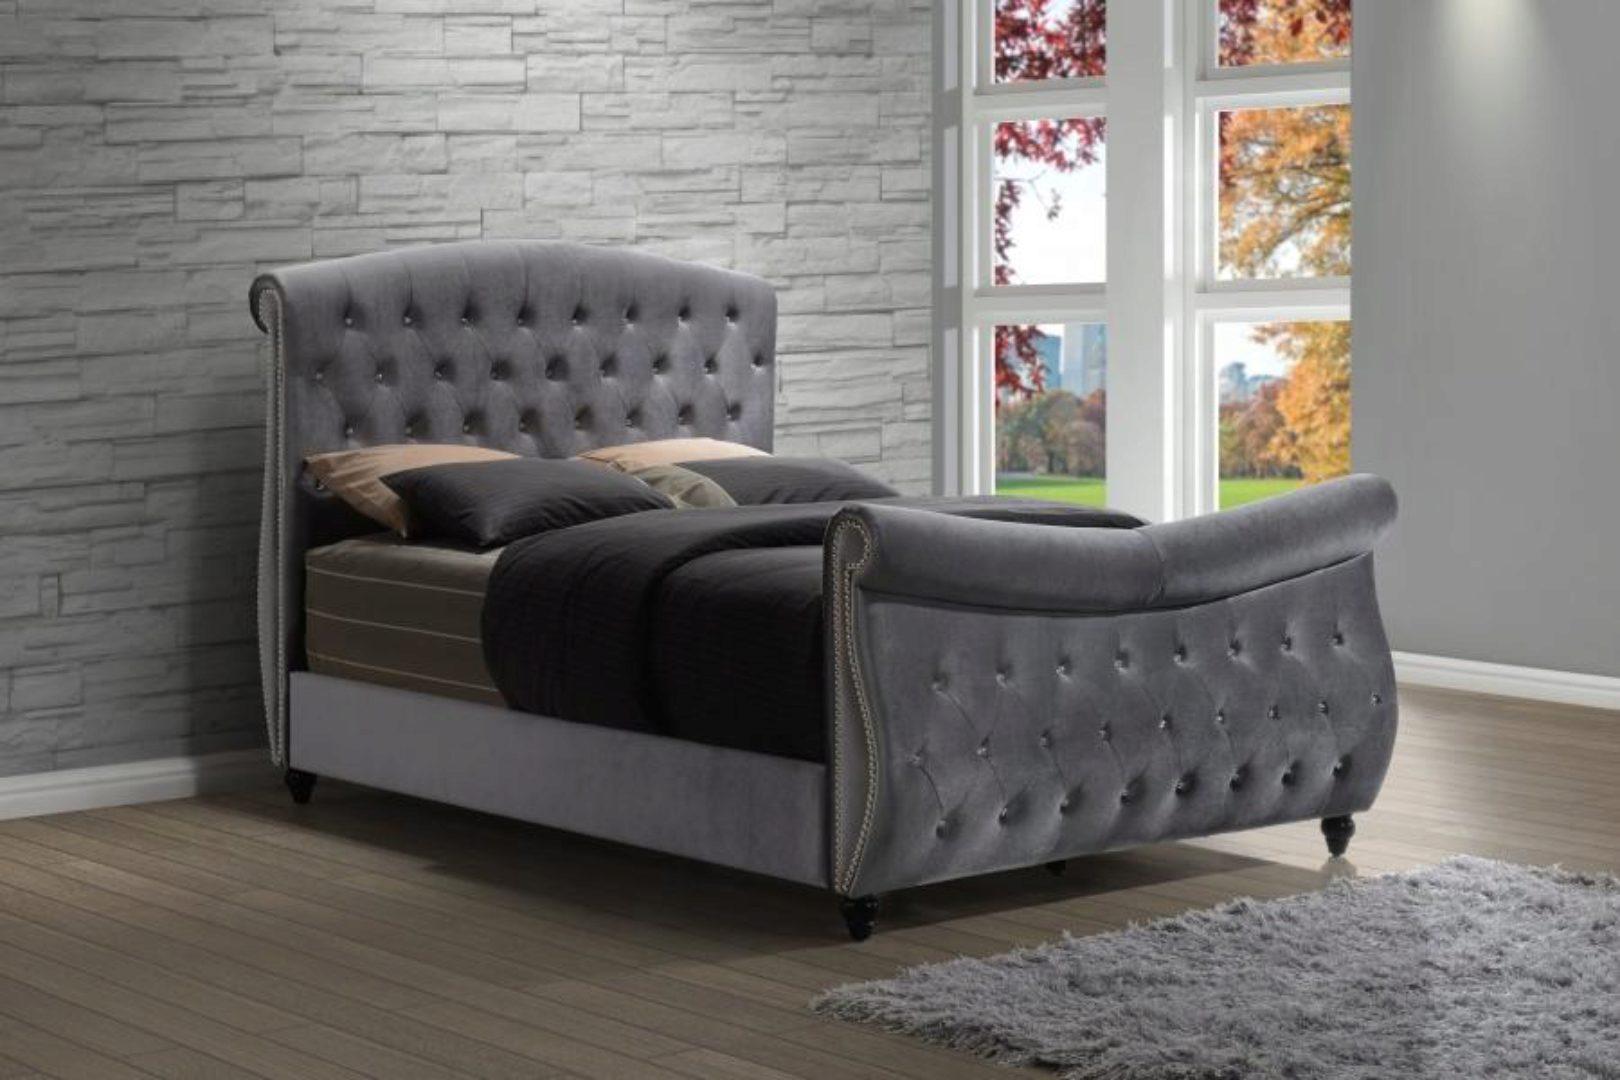 meridian hudson sleigh king size bedroom set 6pcs in grey